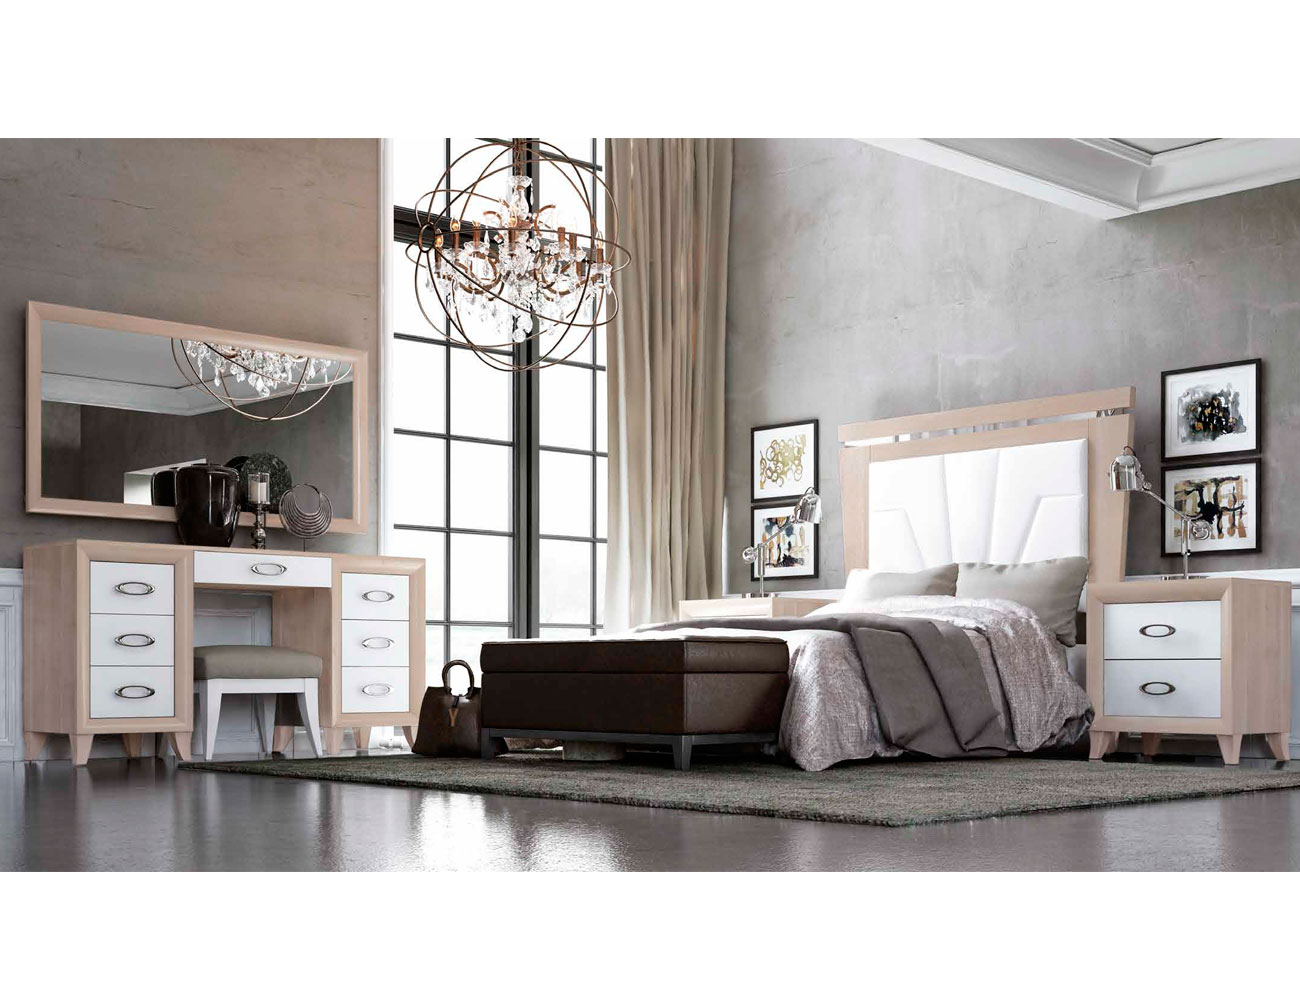 Dormitorio matrimonio romantico con desmaquilladora